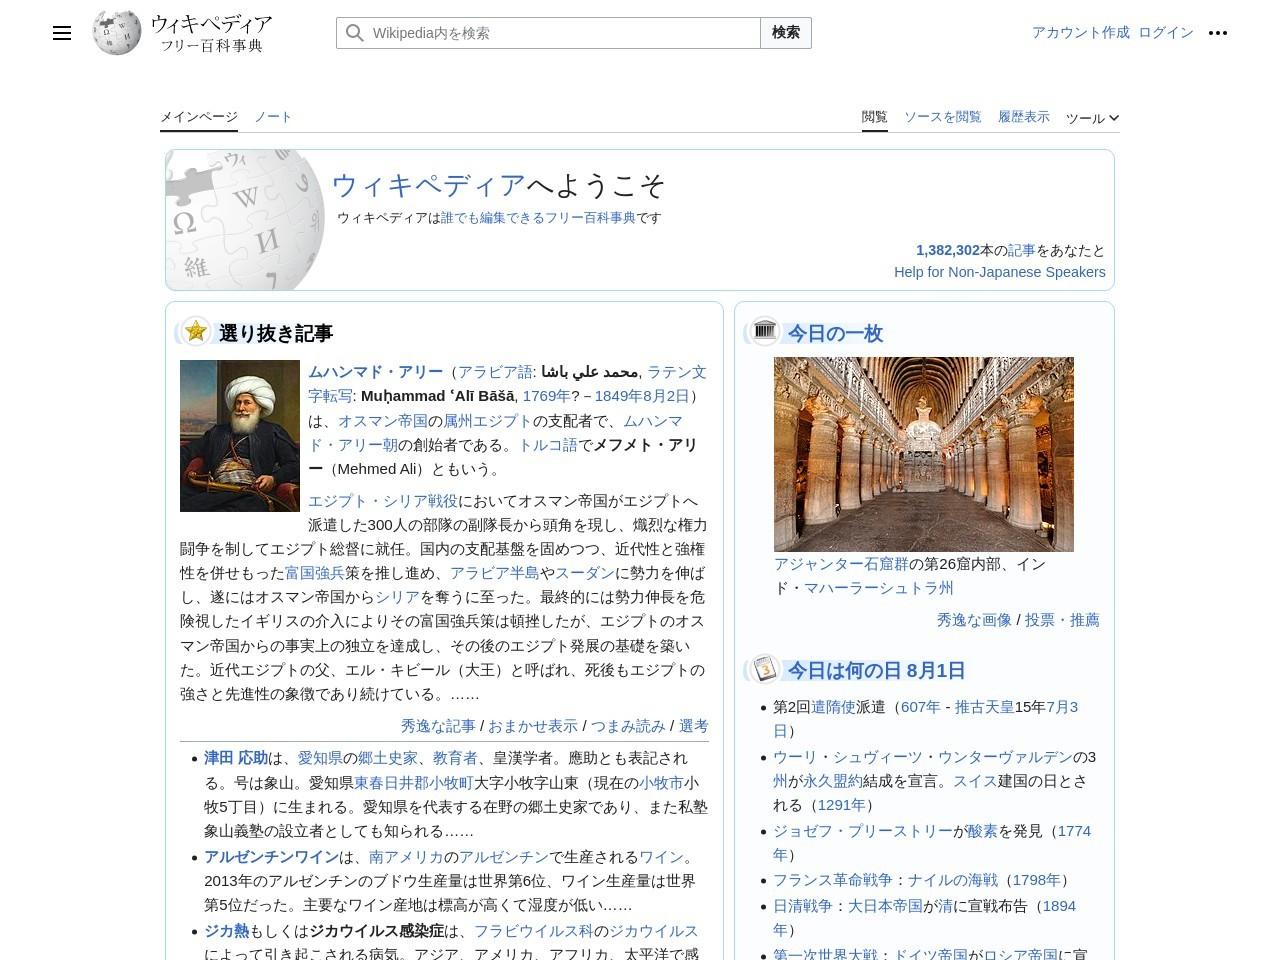 Portable Network Graphics - Wikipedia